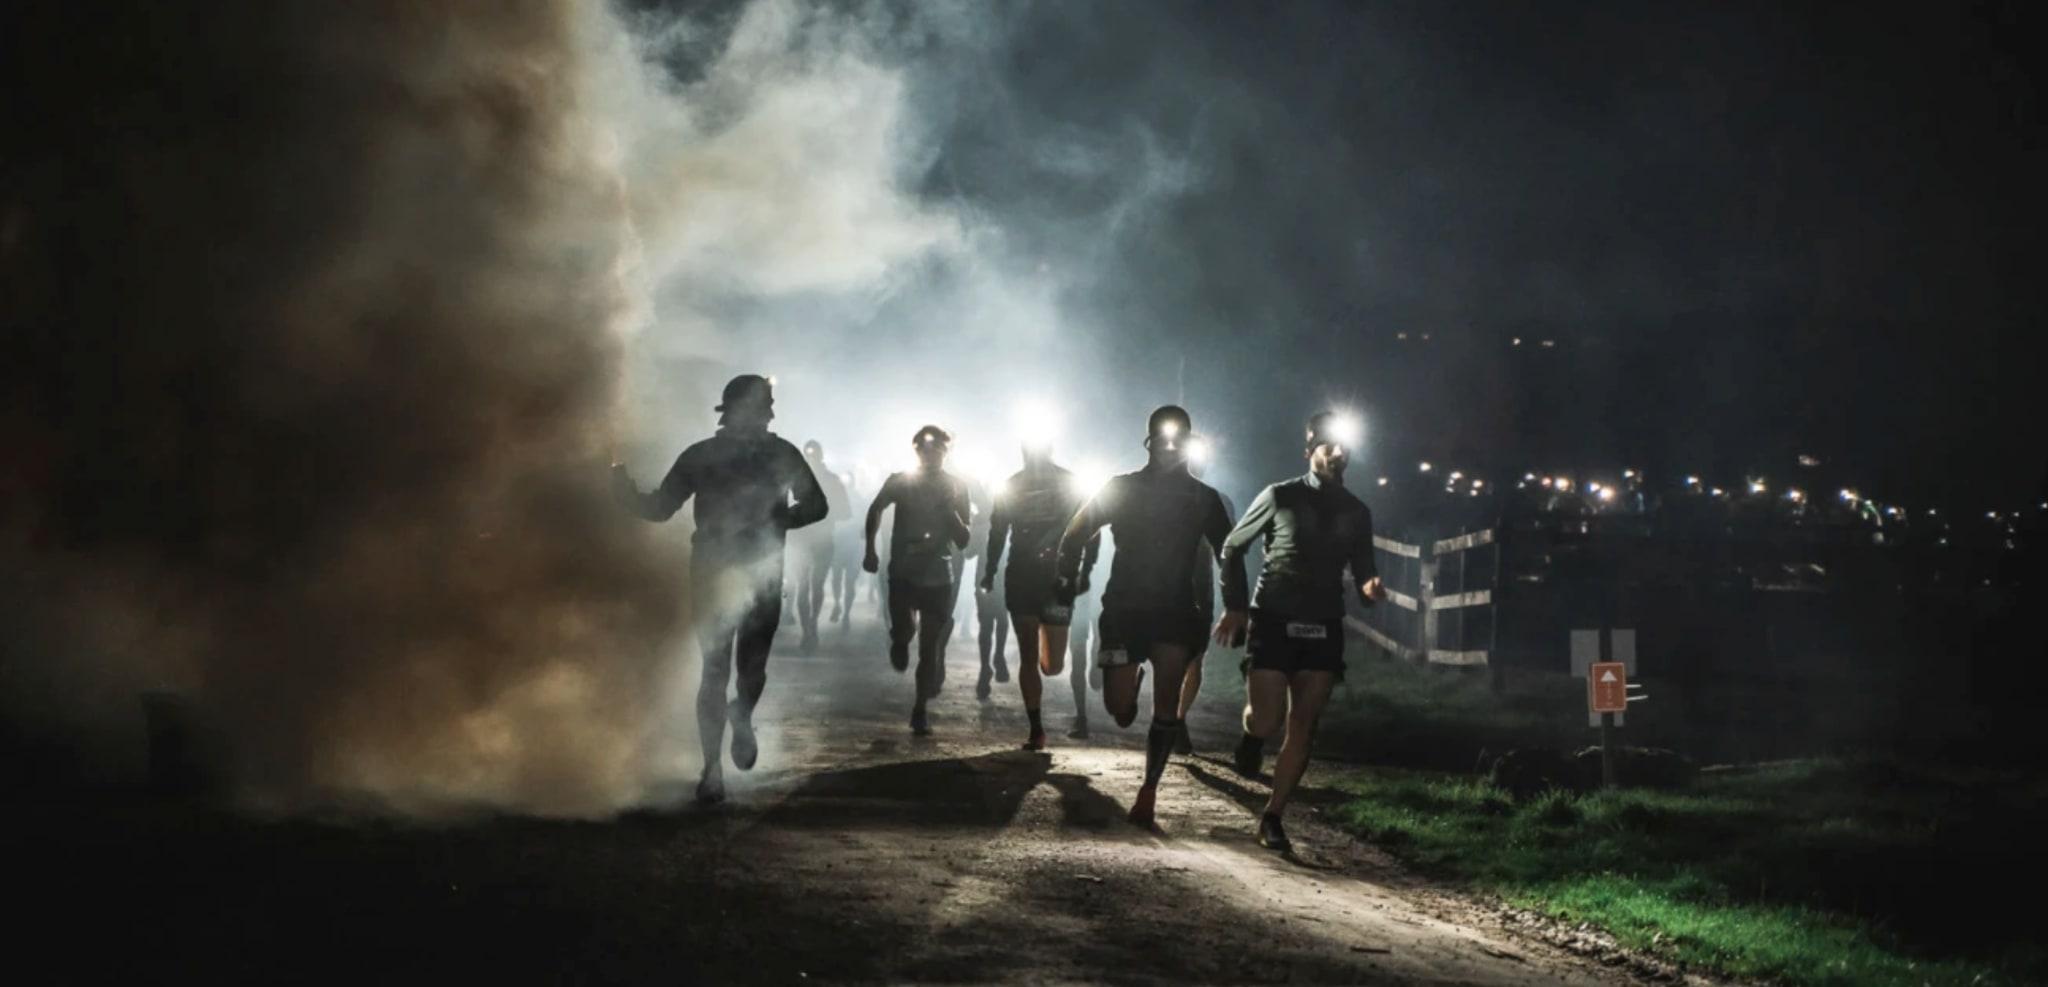 Night runs